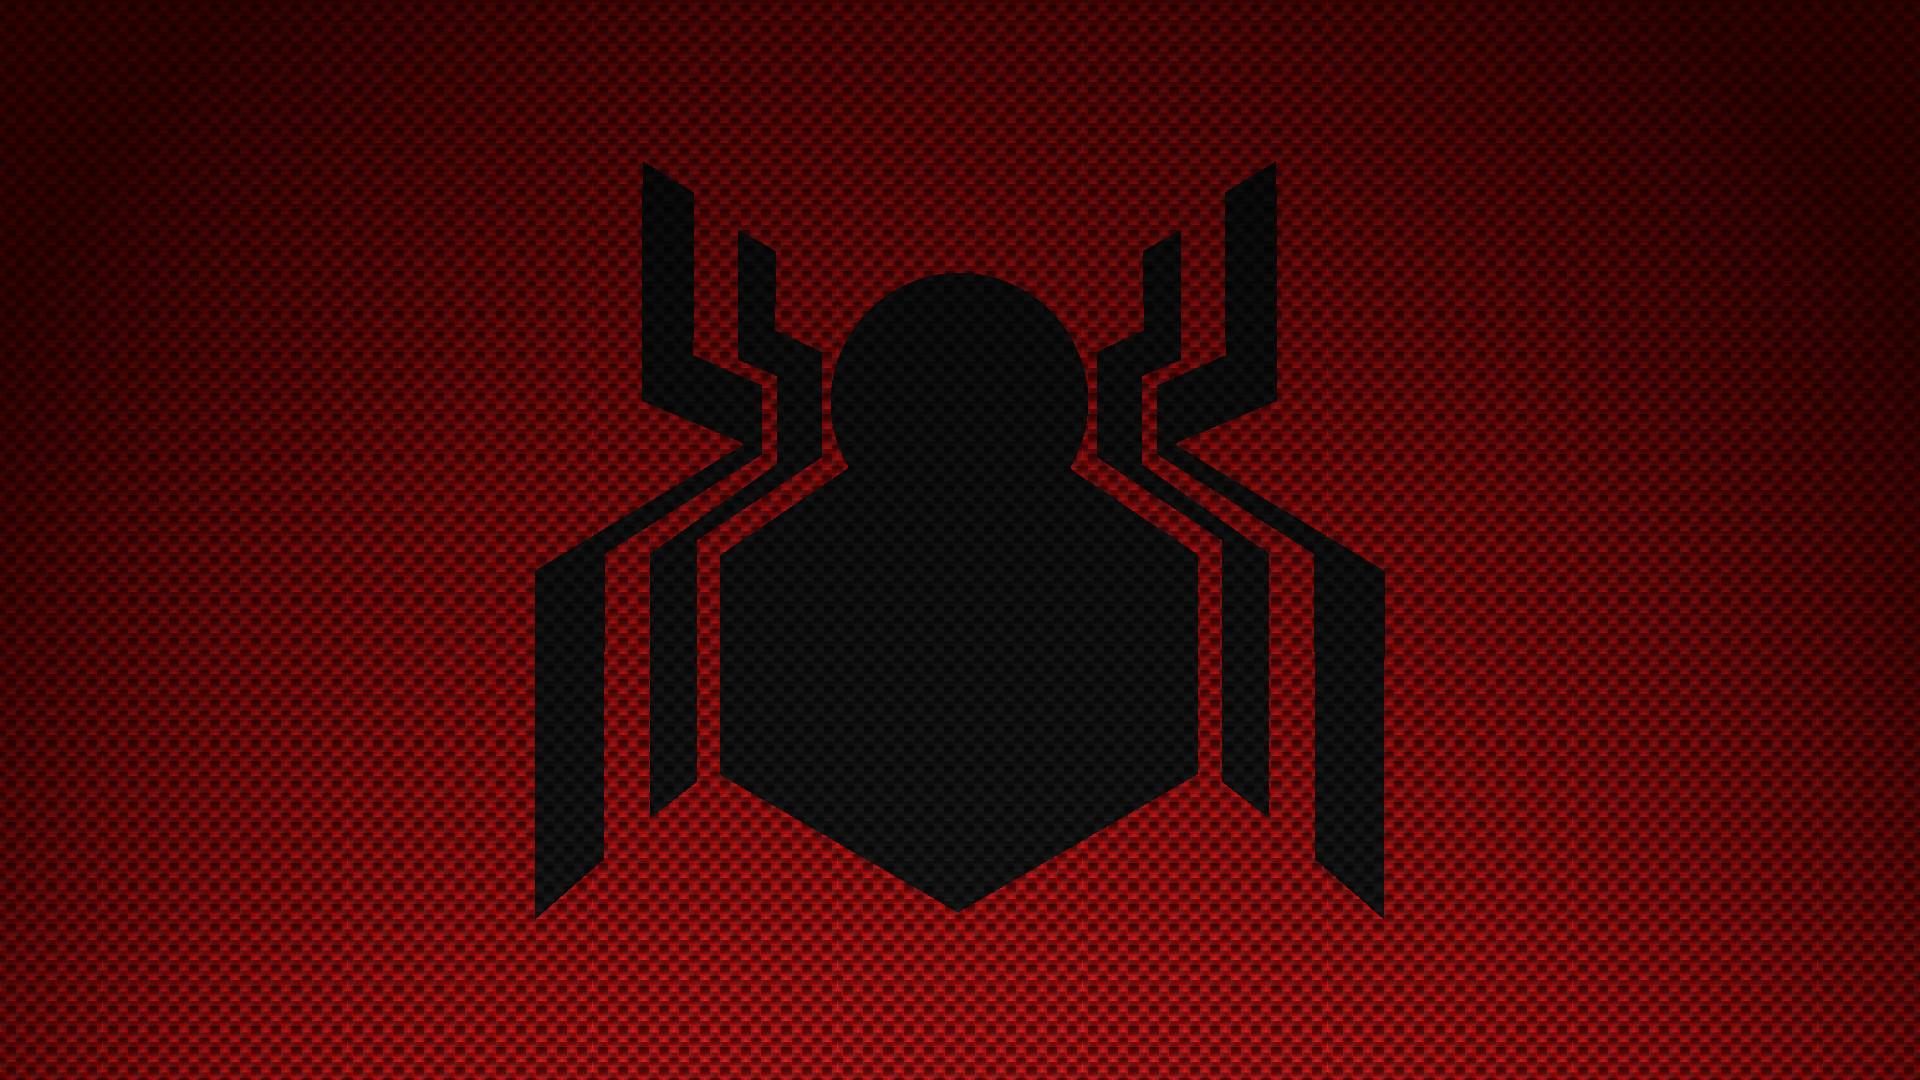 Made a simple MCU Spider-Man Logo wallpaper …